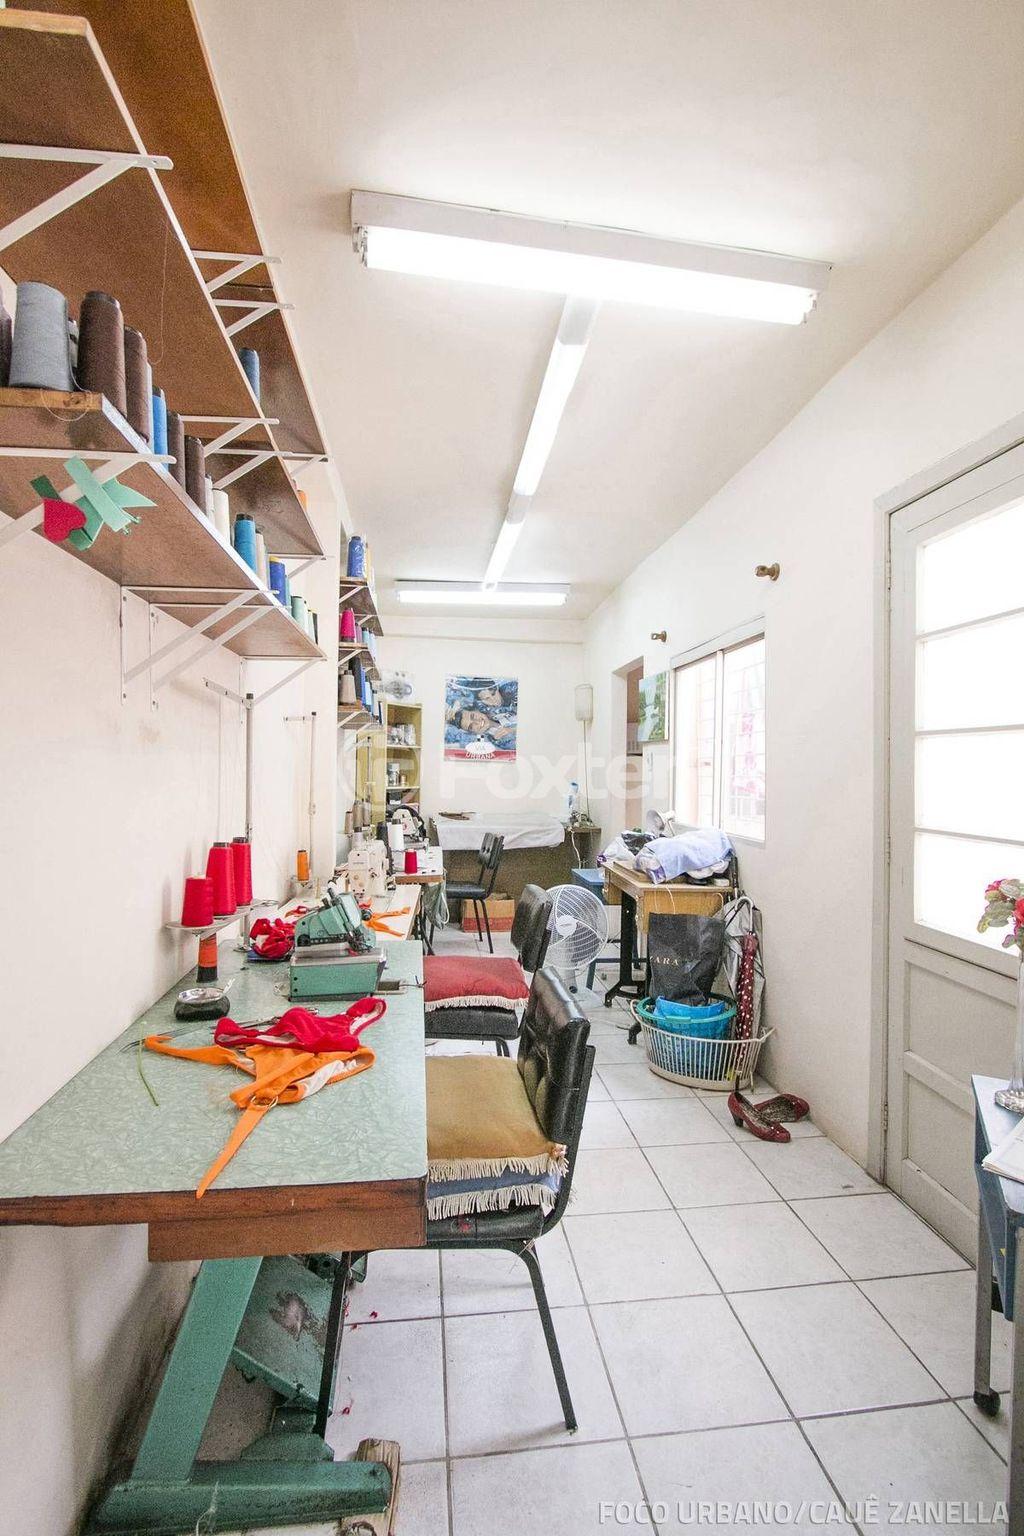 Casa 2 Dorm, Santana, Porto Alegre (7542) - Foto 13